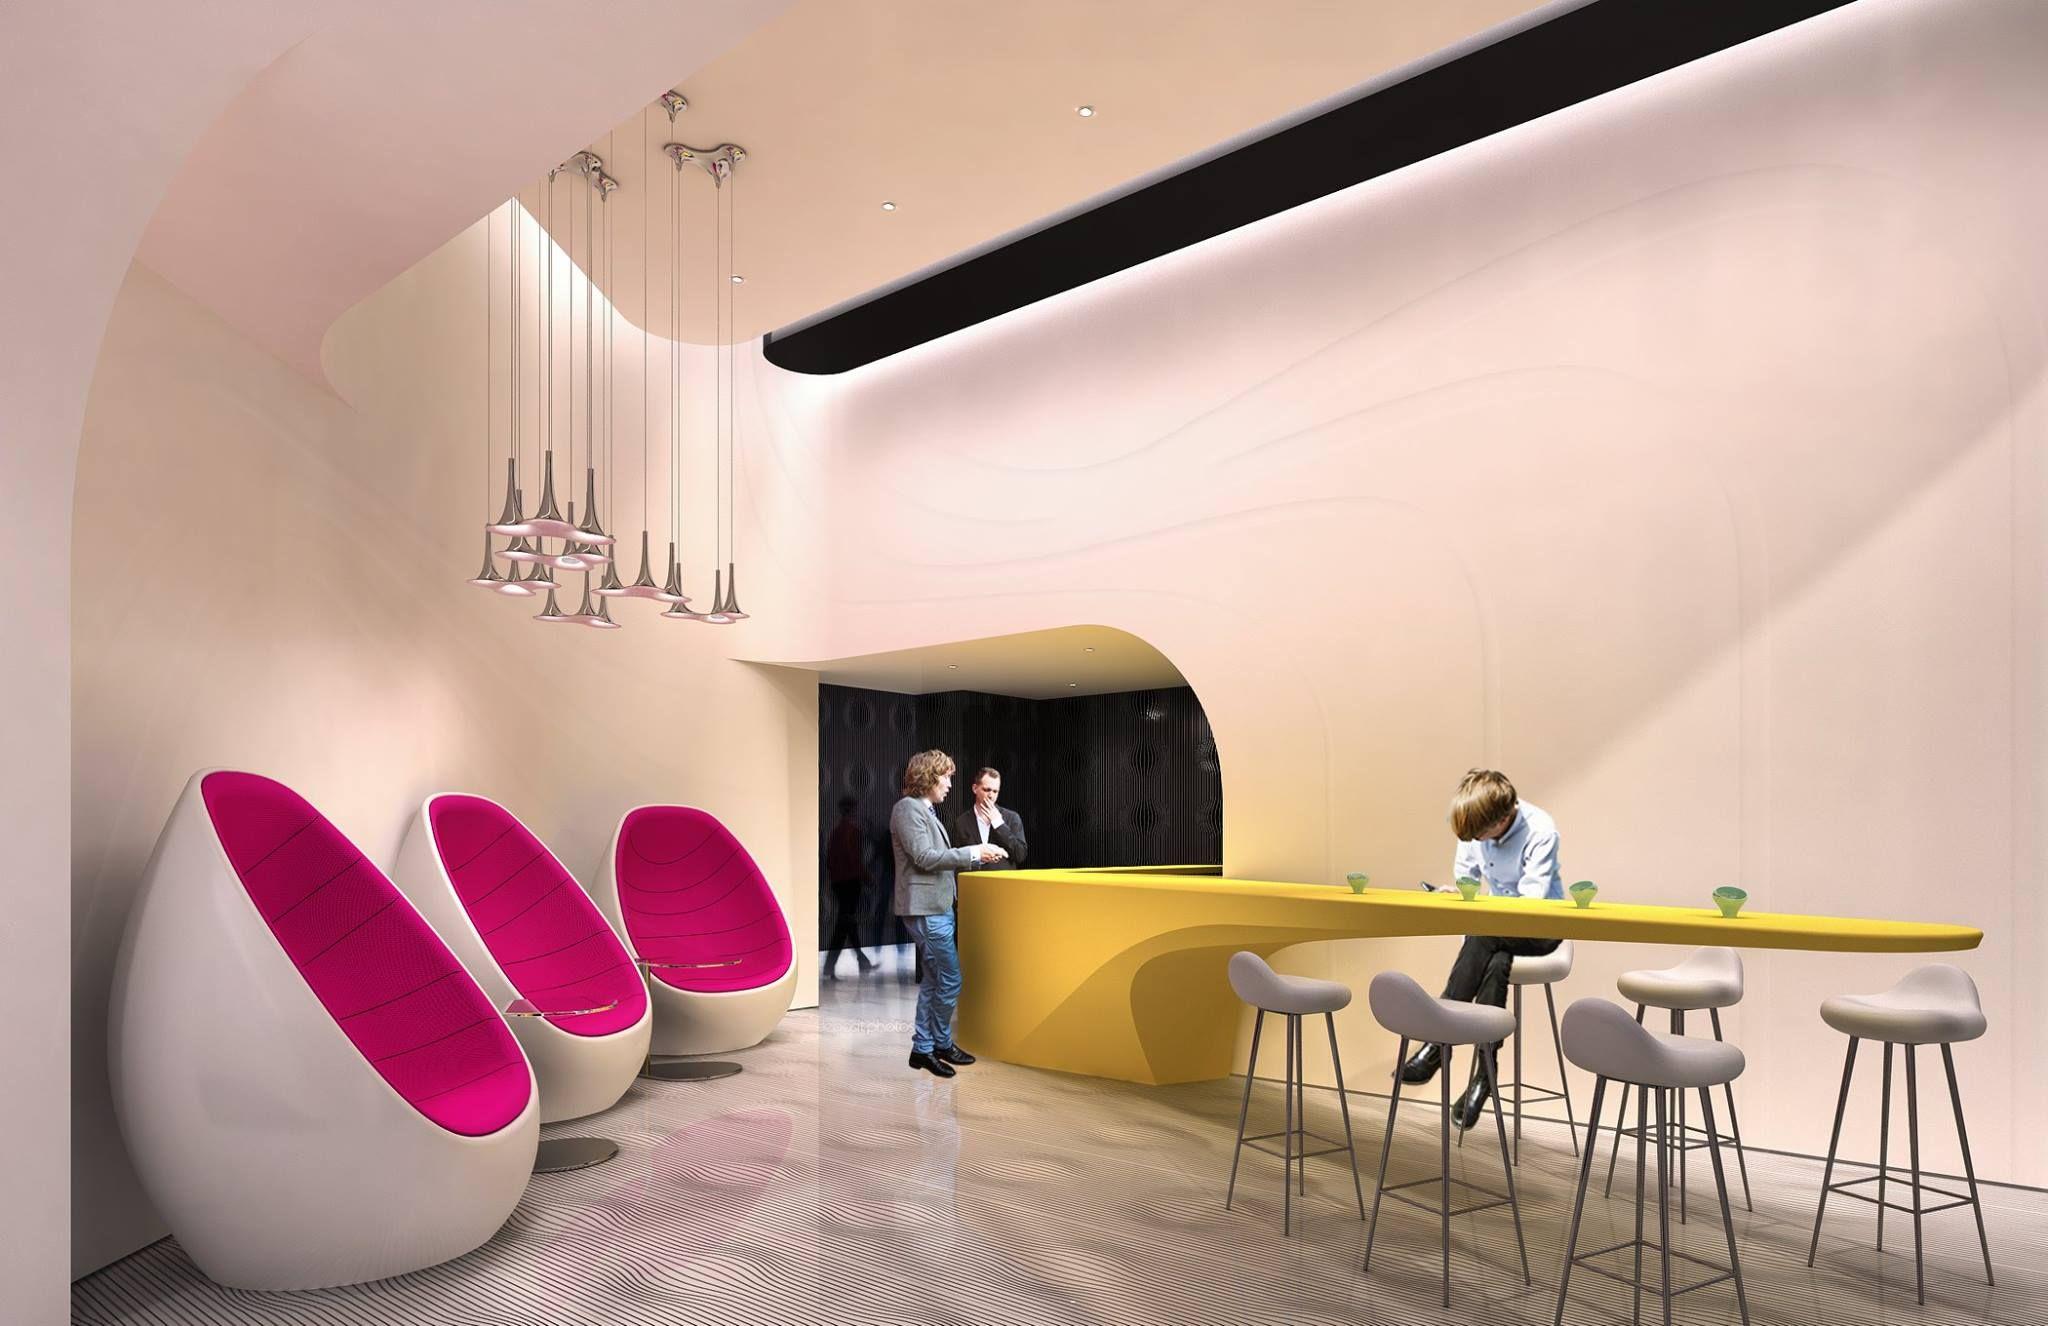 karim rashid interior design-ის სურათის შედეგი